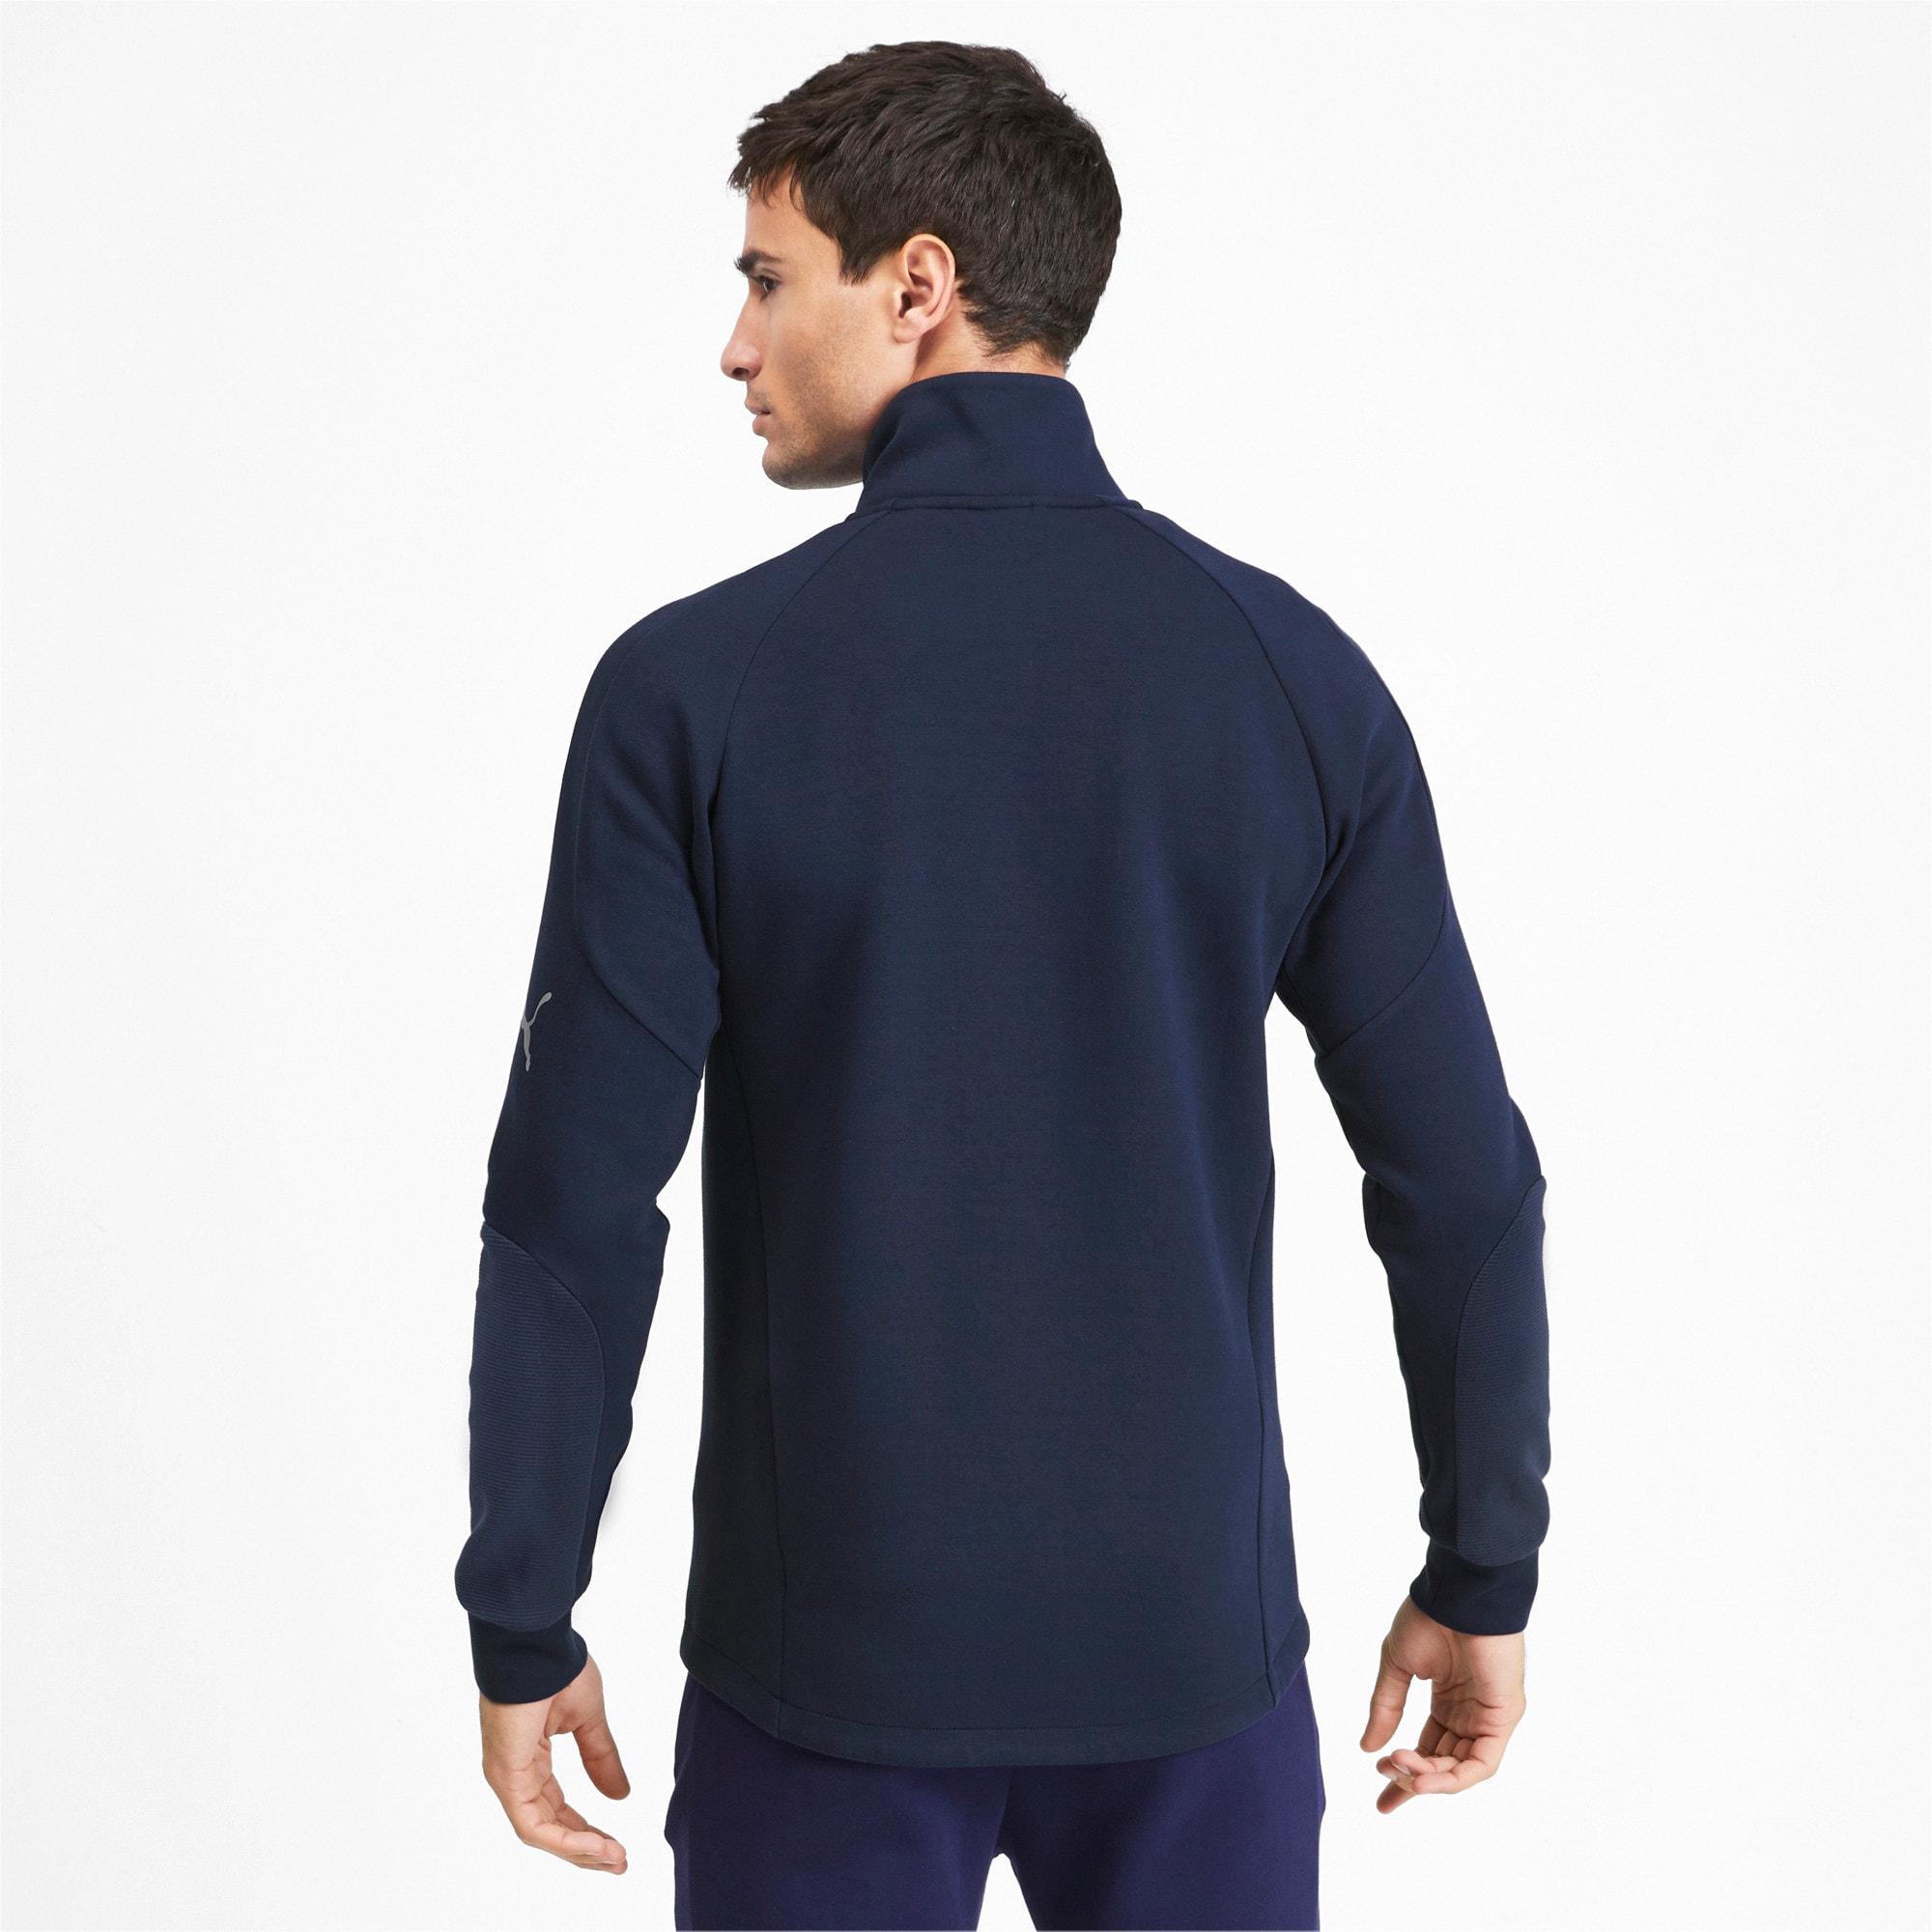 Thumbnail 2 of Evostripe Long Sleeve Men's Jacket, Peacoat, medium